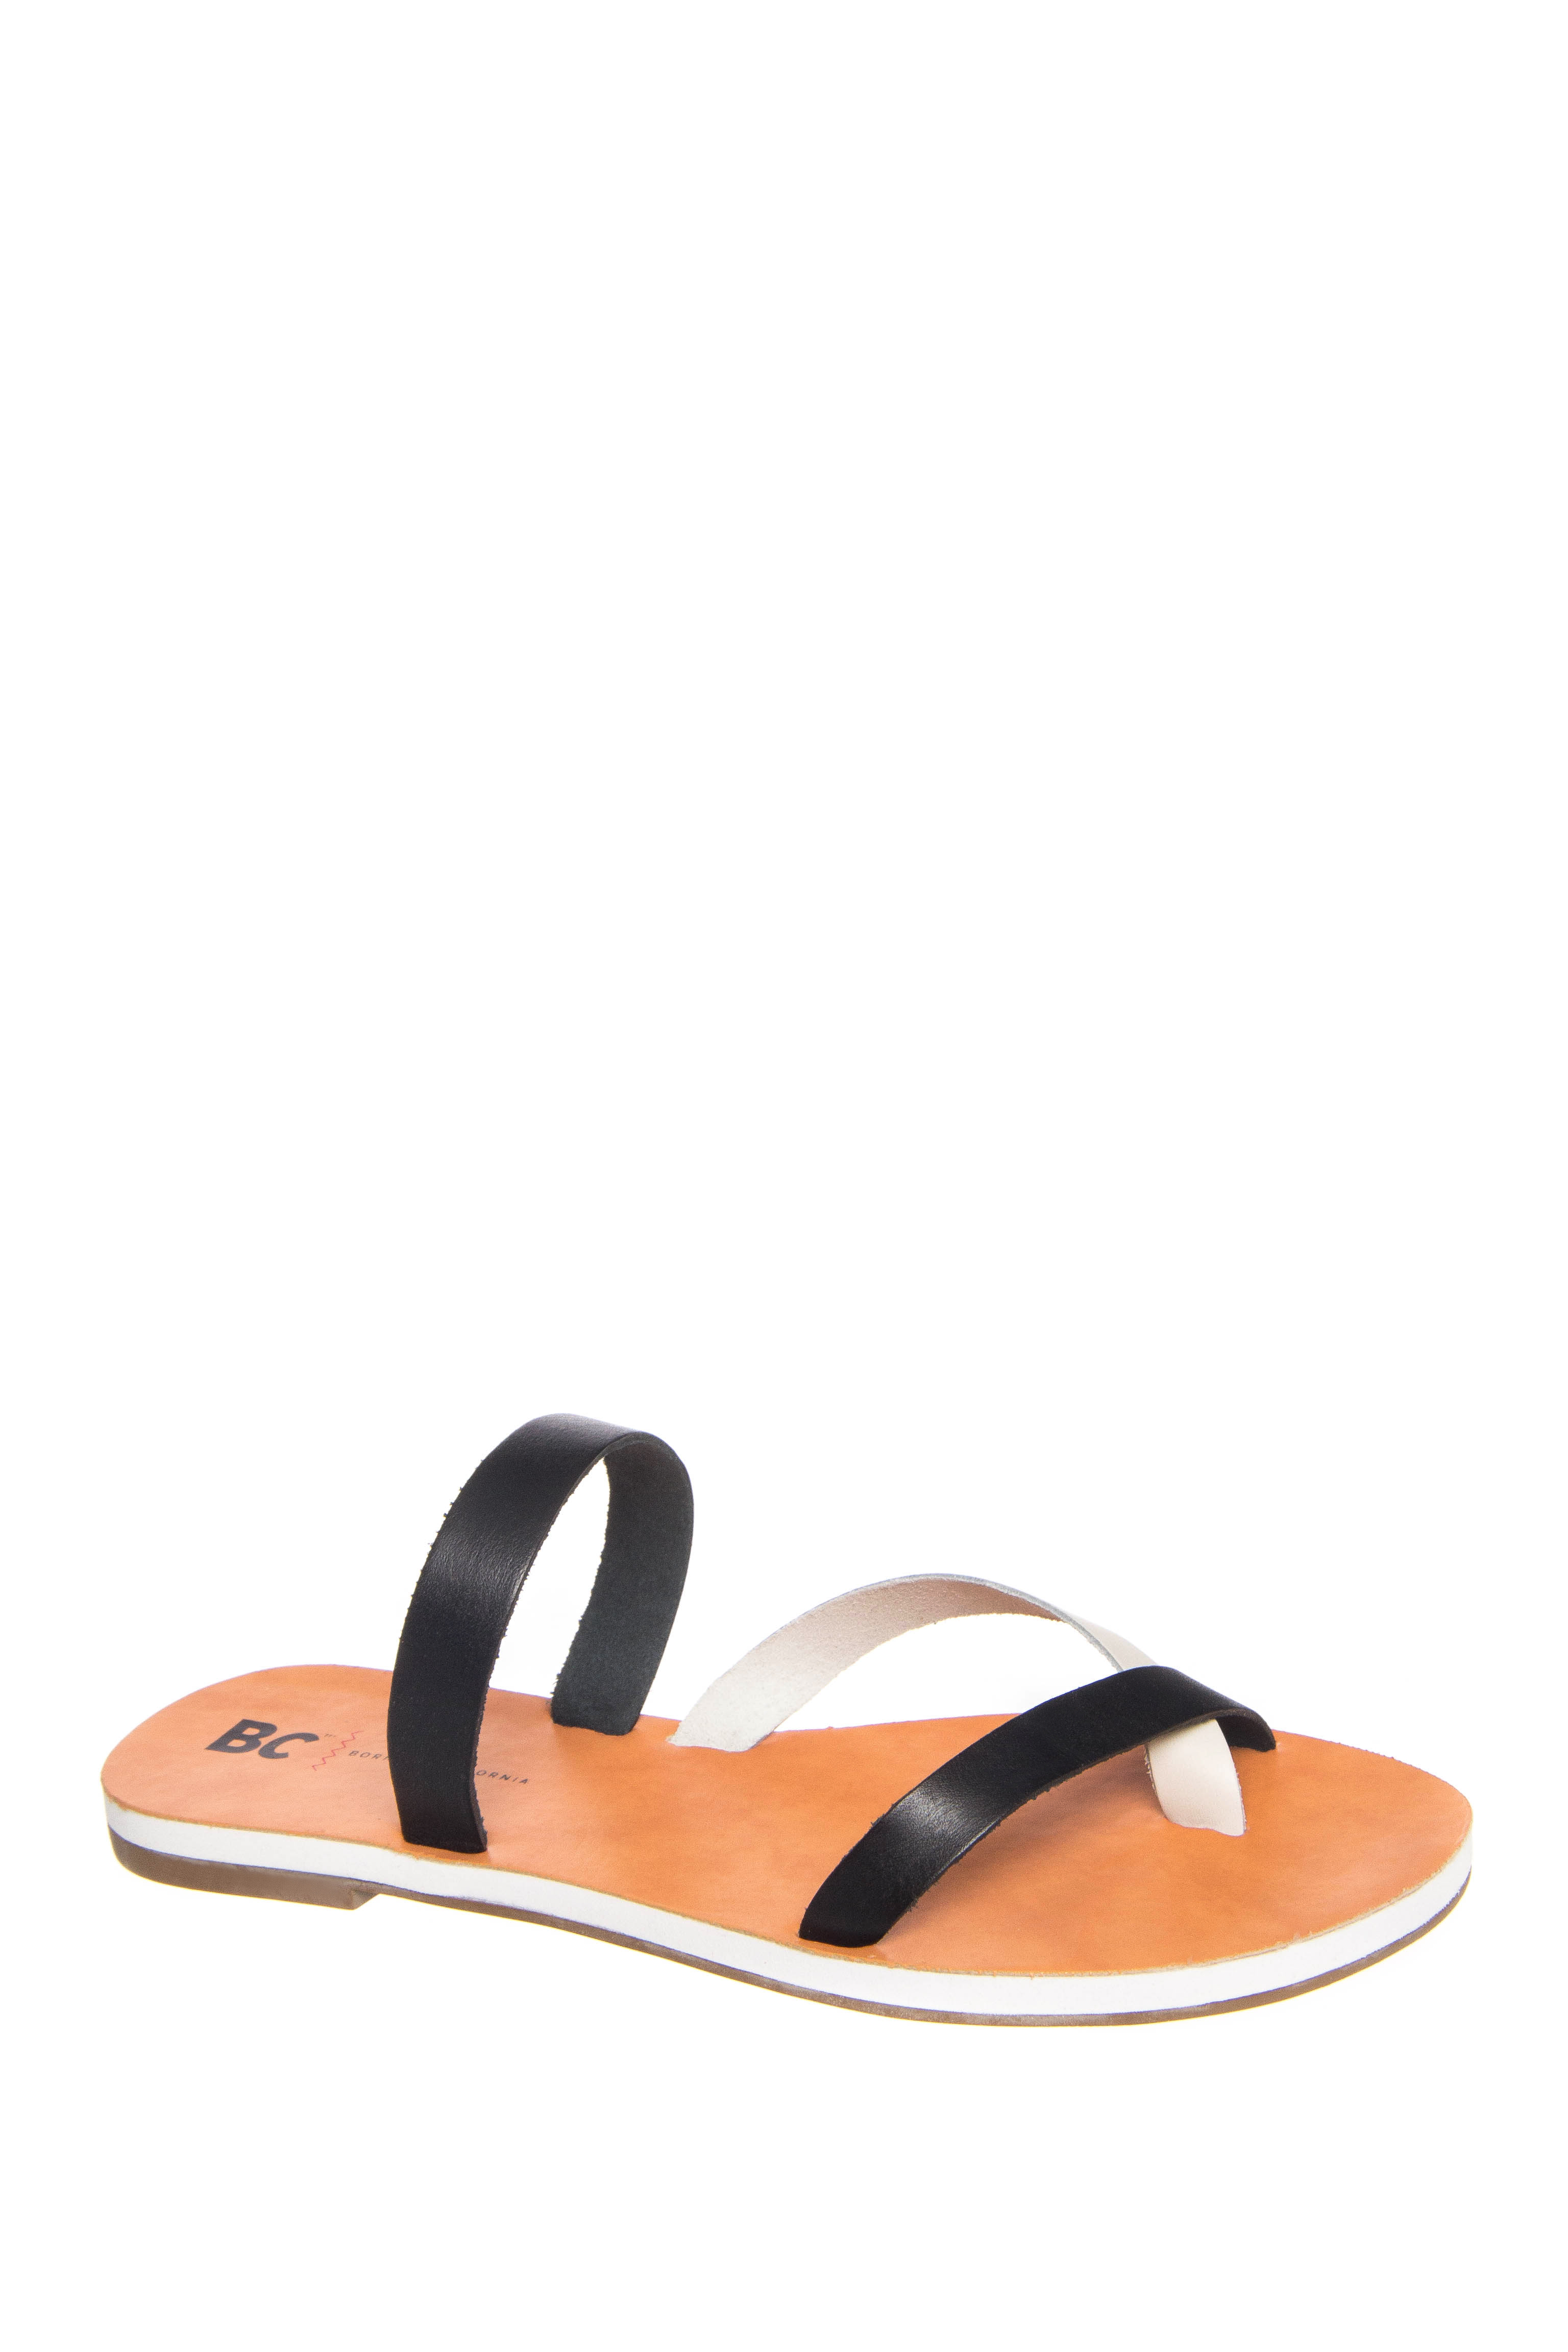 BC Footwear Tiny Flats Sandals - Black / White